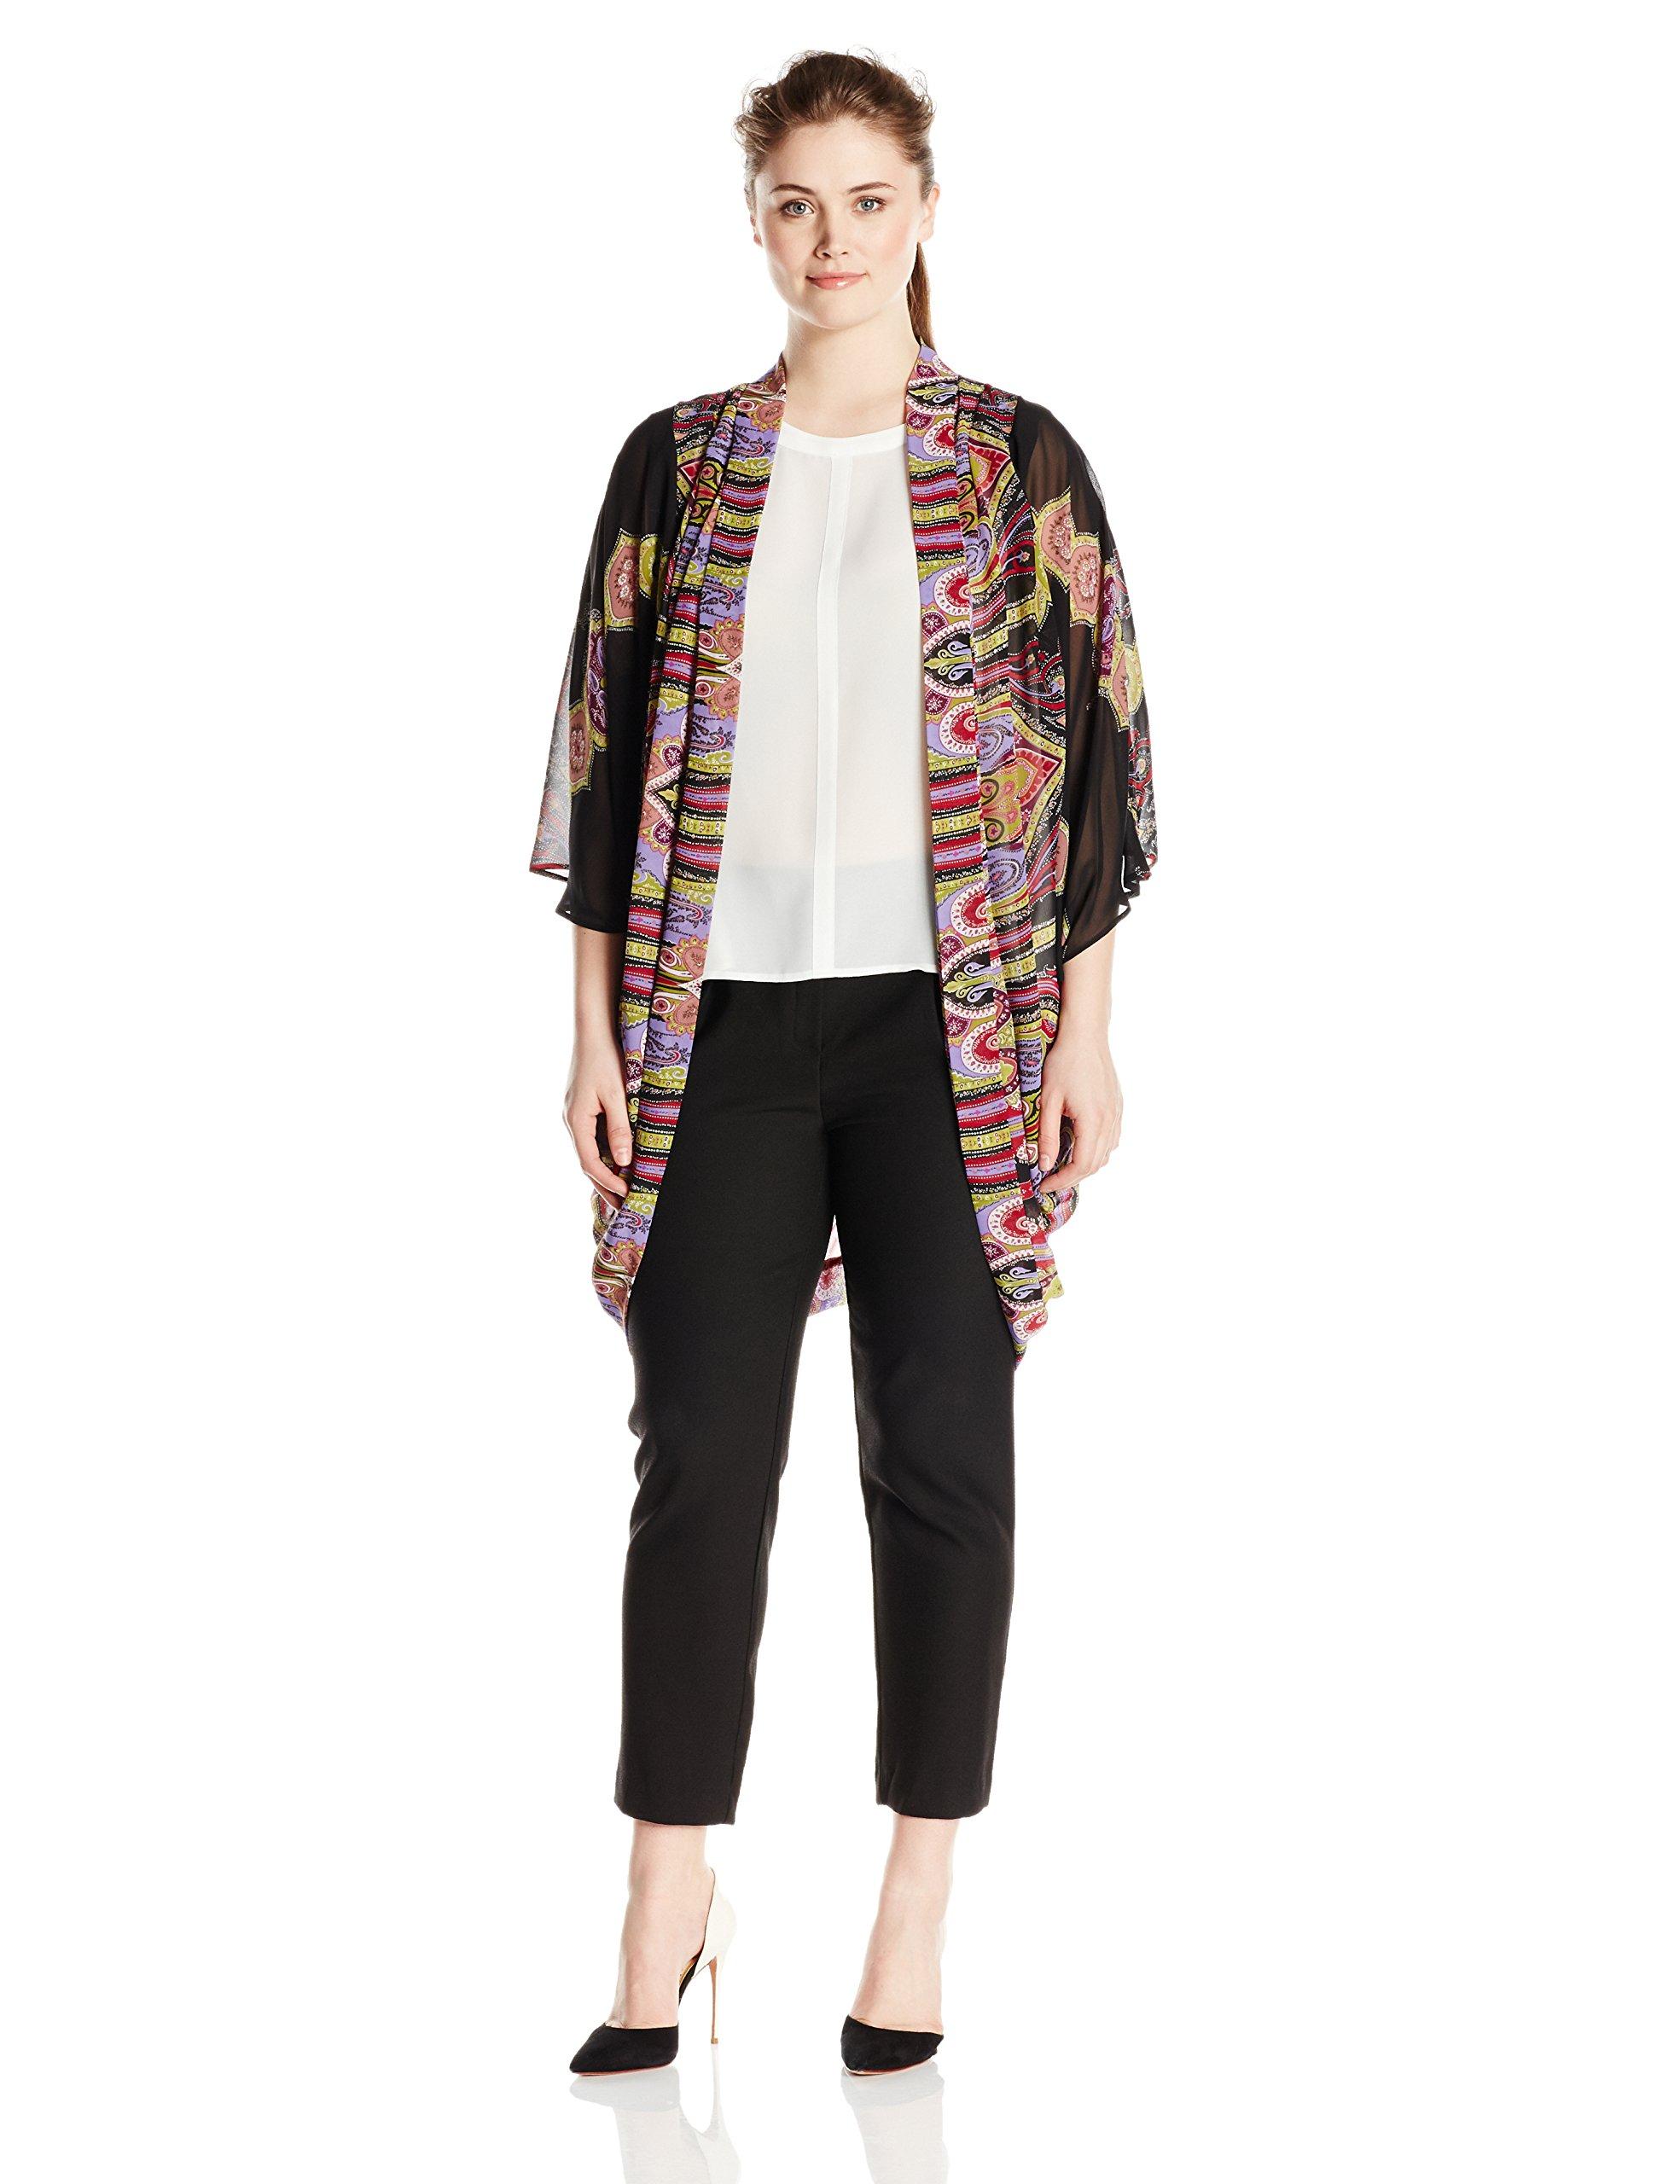 Single Dress Women's Plus Size Cocoon Kimono Sweater, Black/Multi, 3X